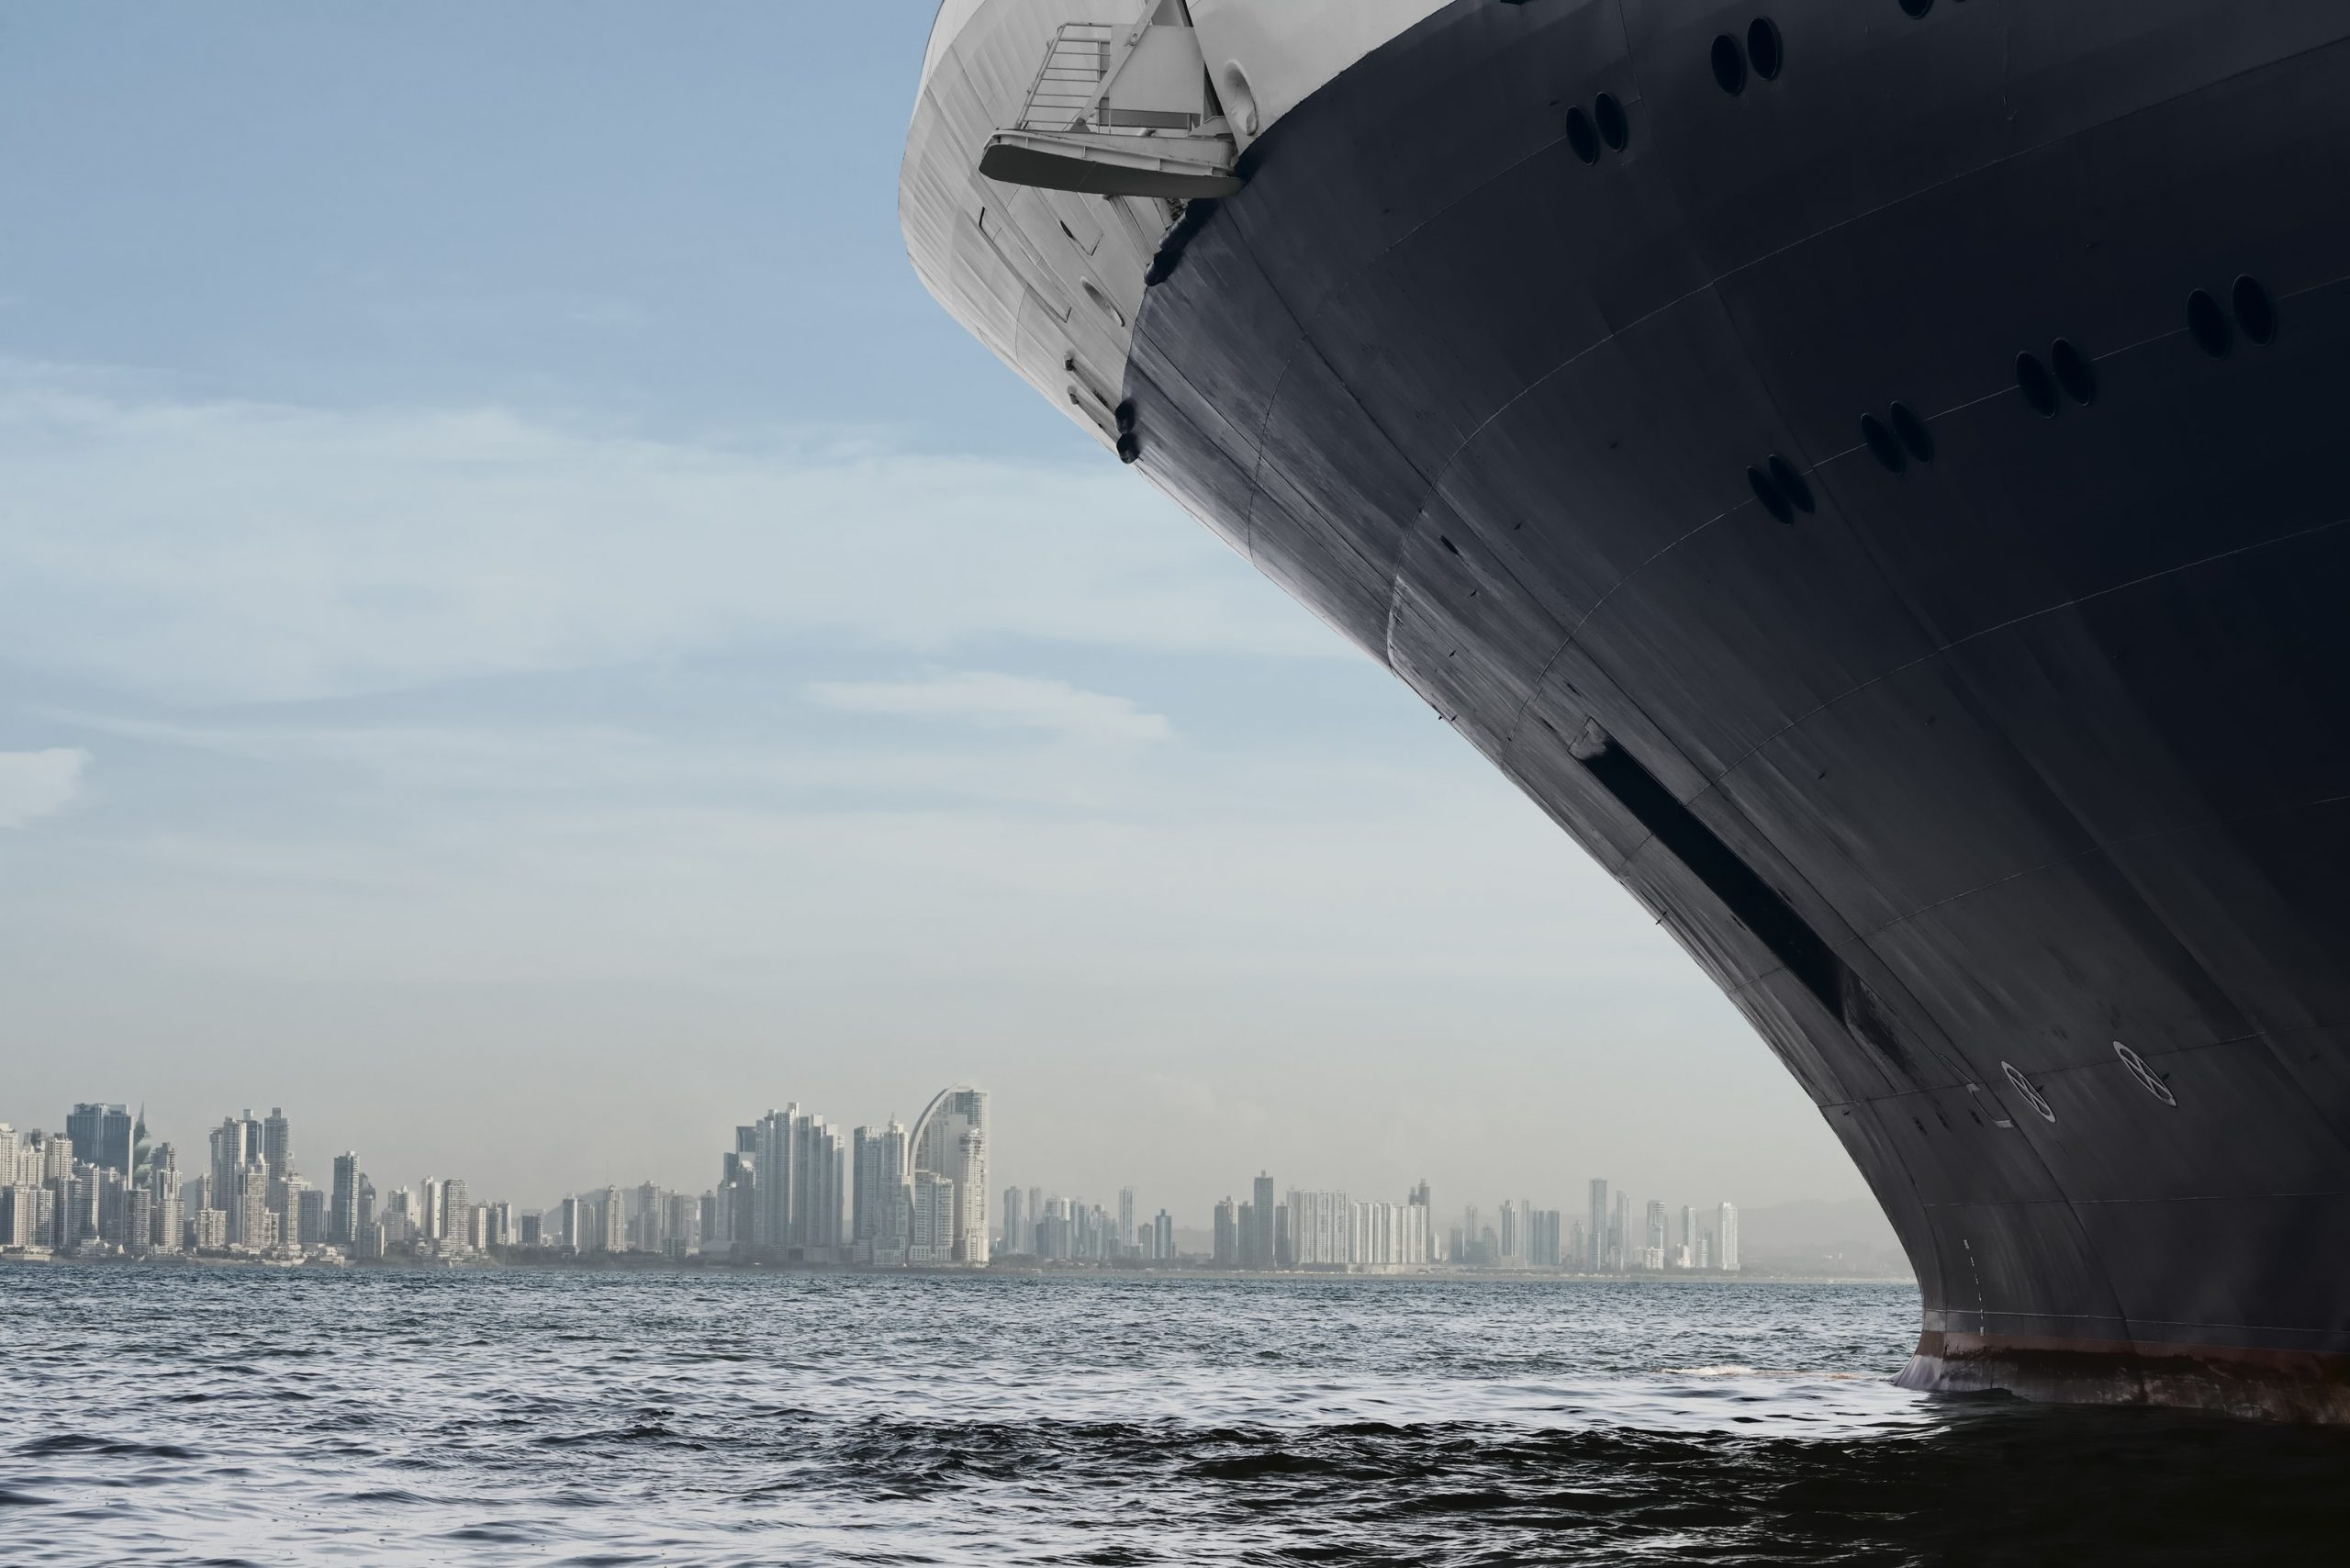 Panama City Skyline. Grosses Kreuzfahrtschiff, das in Panama-Stadt einfährt.